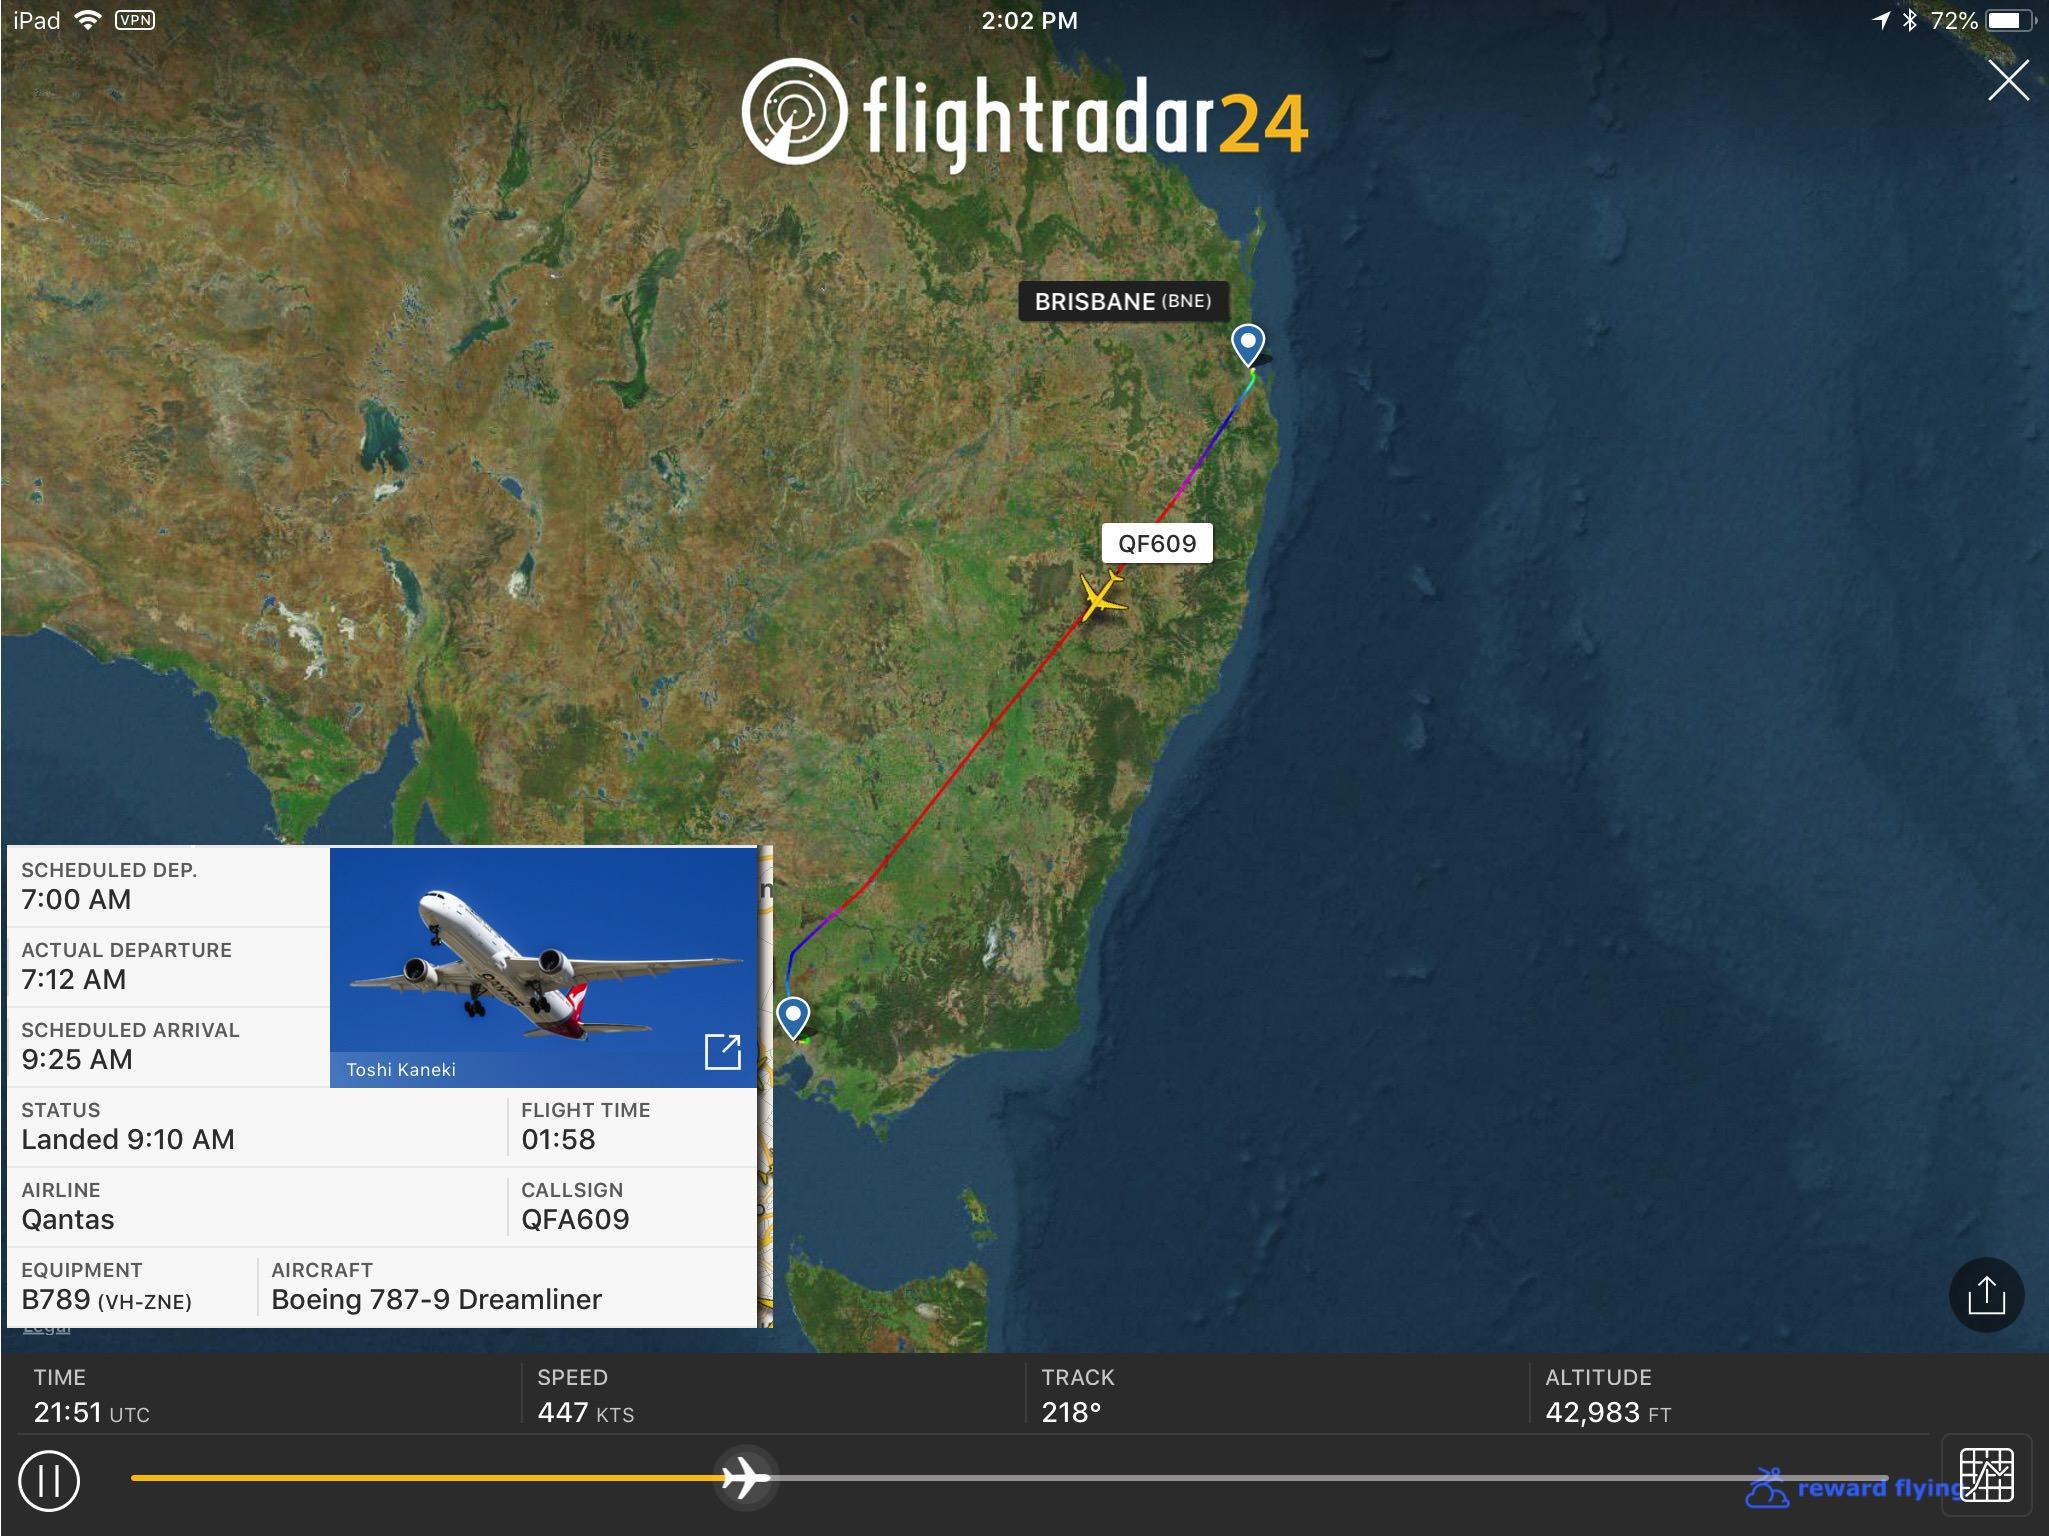 QF609 Flightpath.jpg